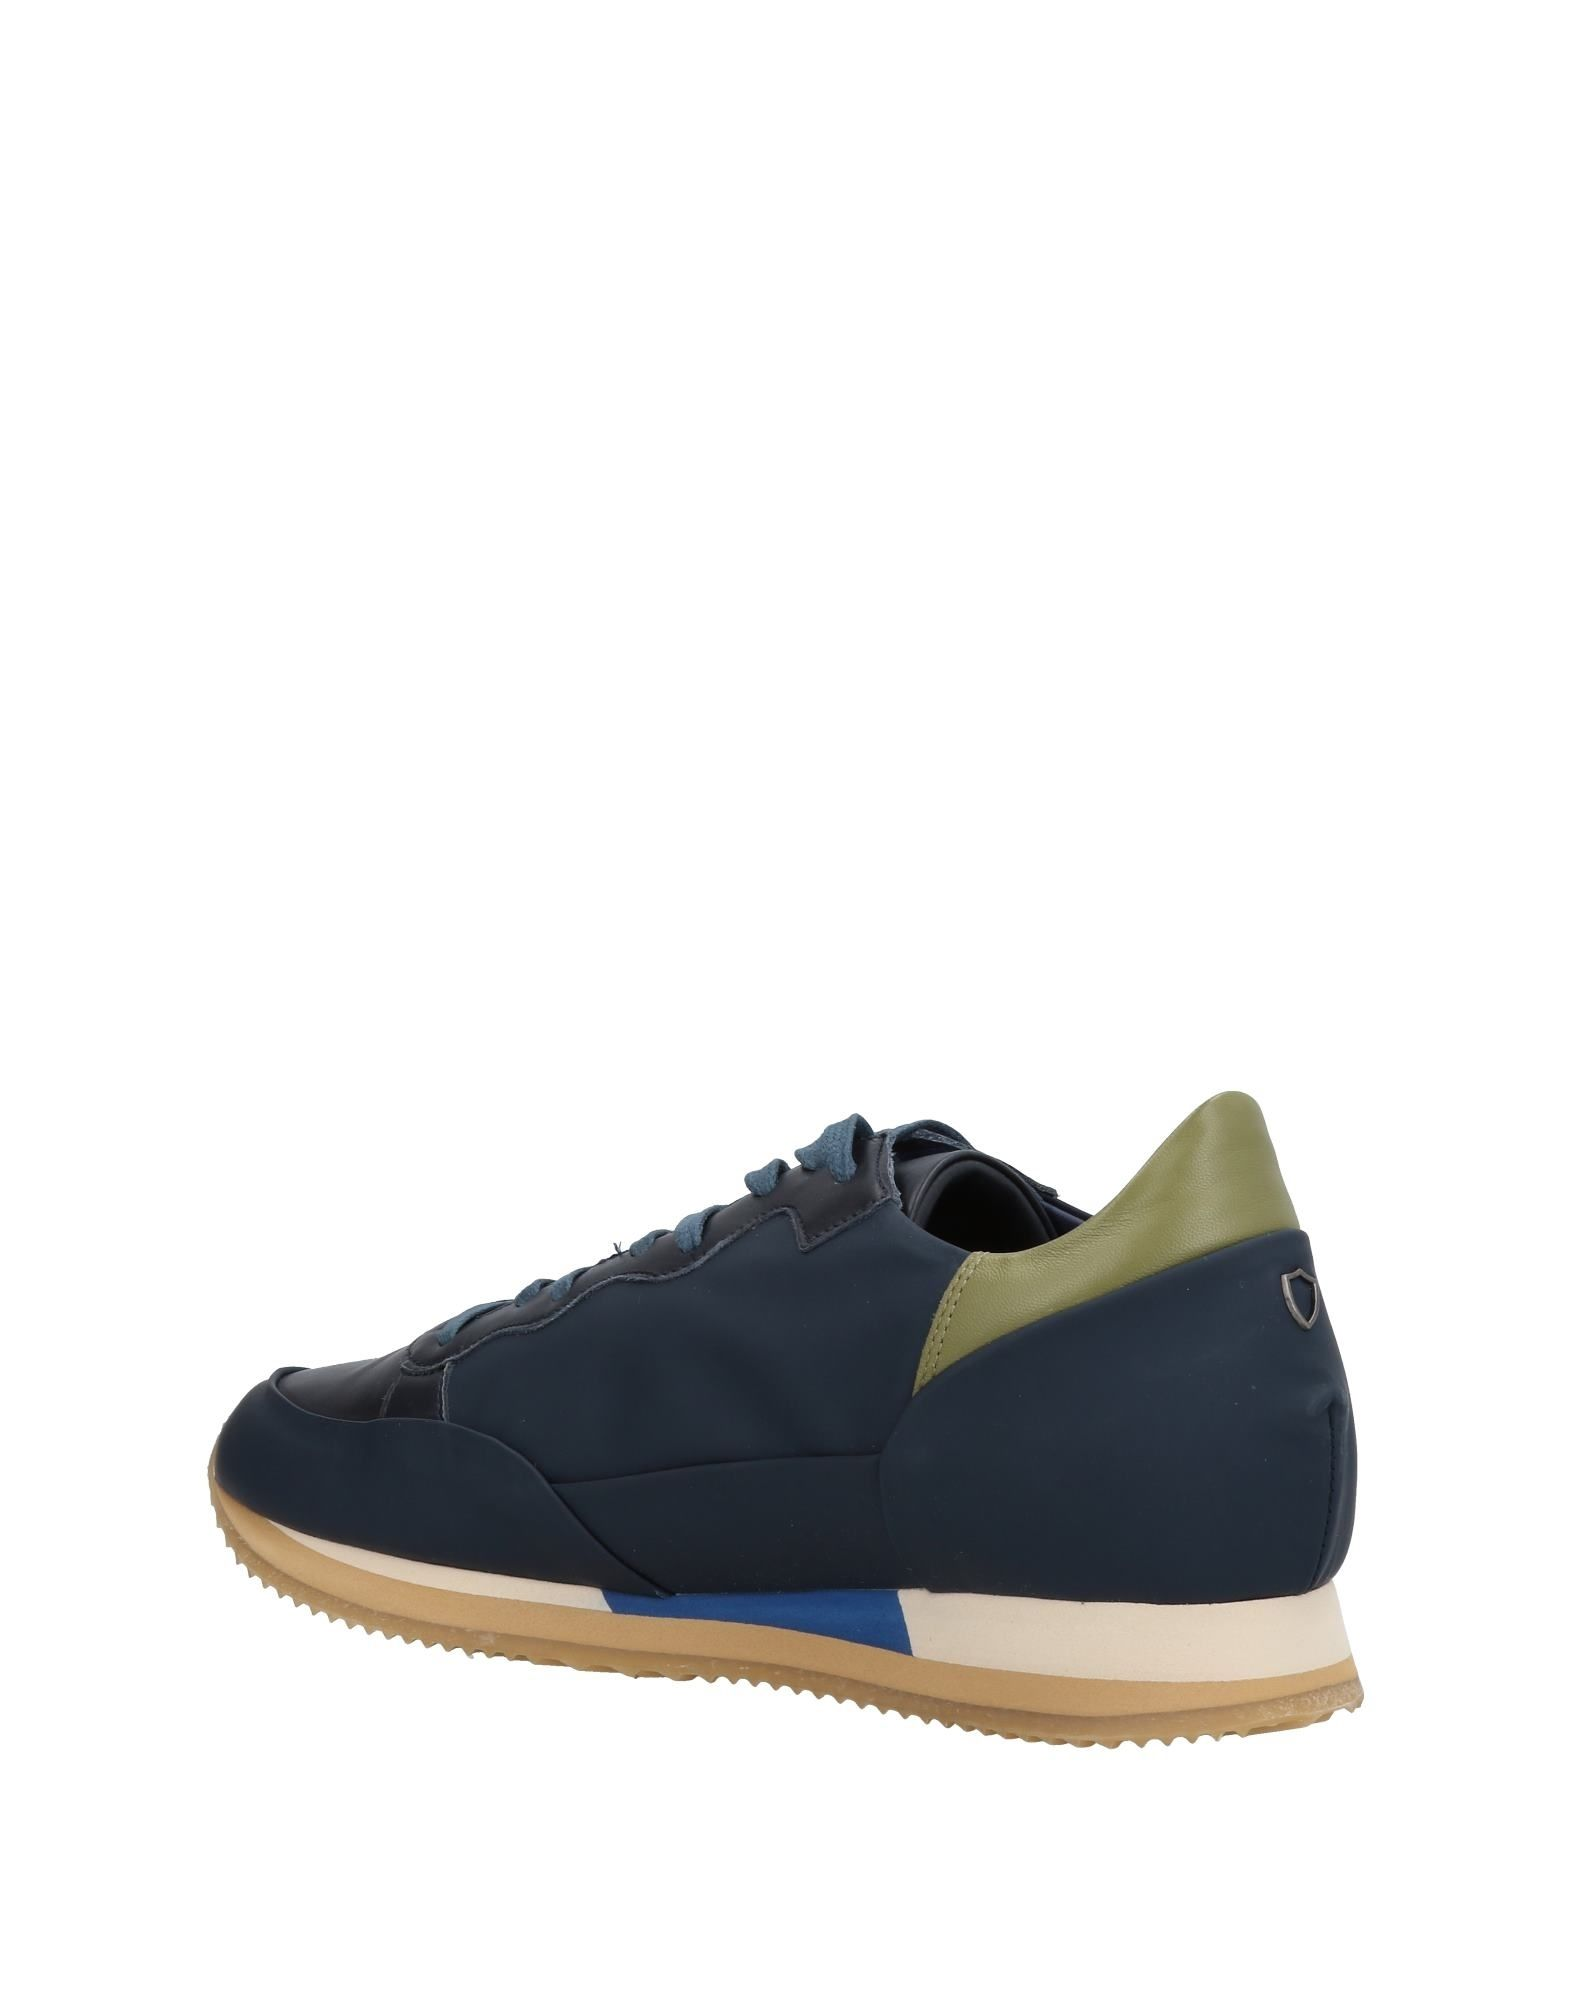 Philippe Model Sneakers Herren beliebte  11444320IN Gute Qualität beliebte Herren Schuhe a0e61b